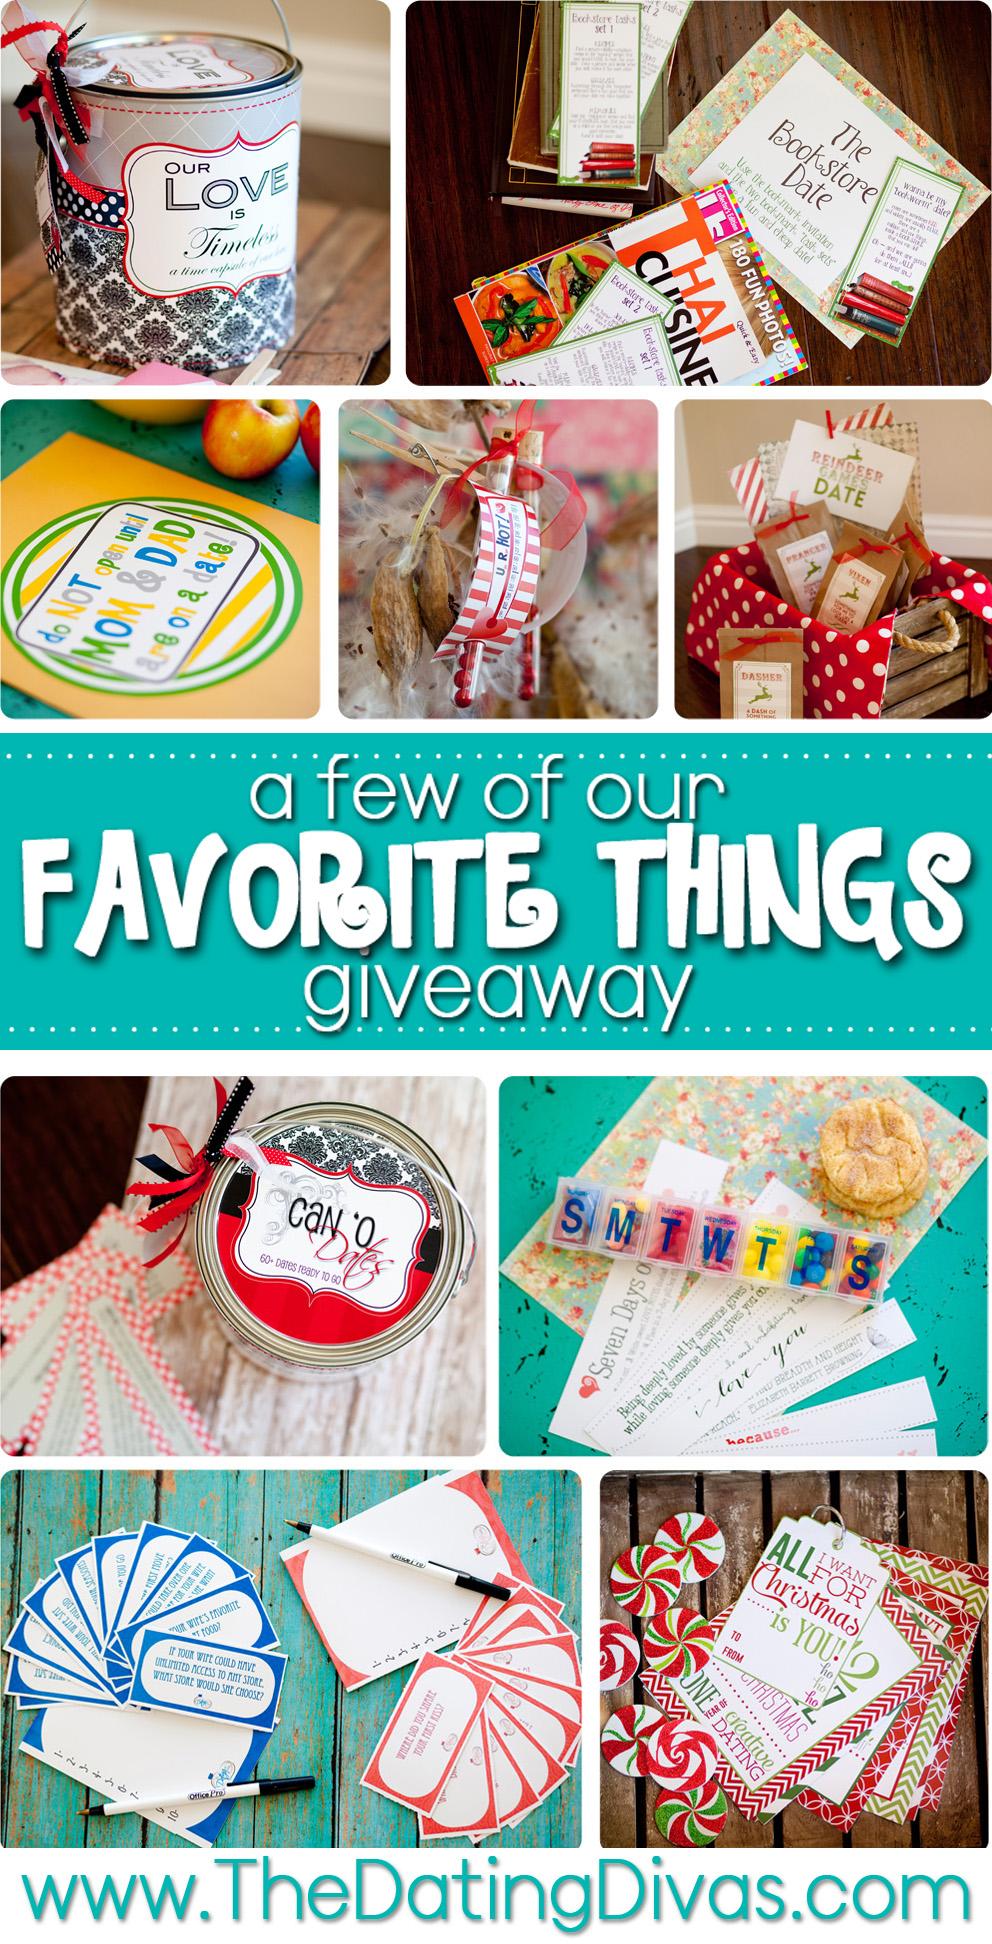 Tara-Favorite-Things-Pinterest